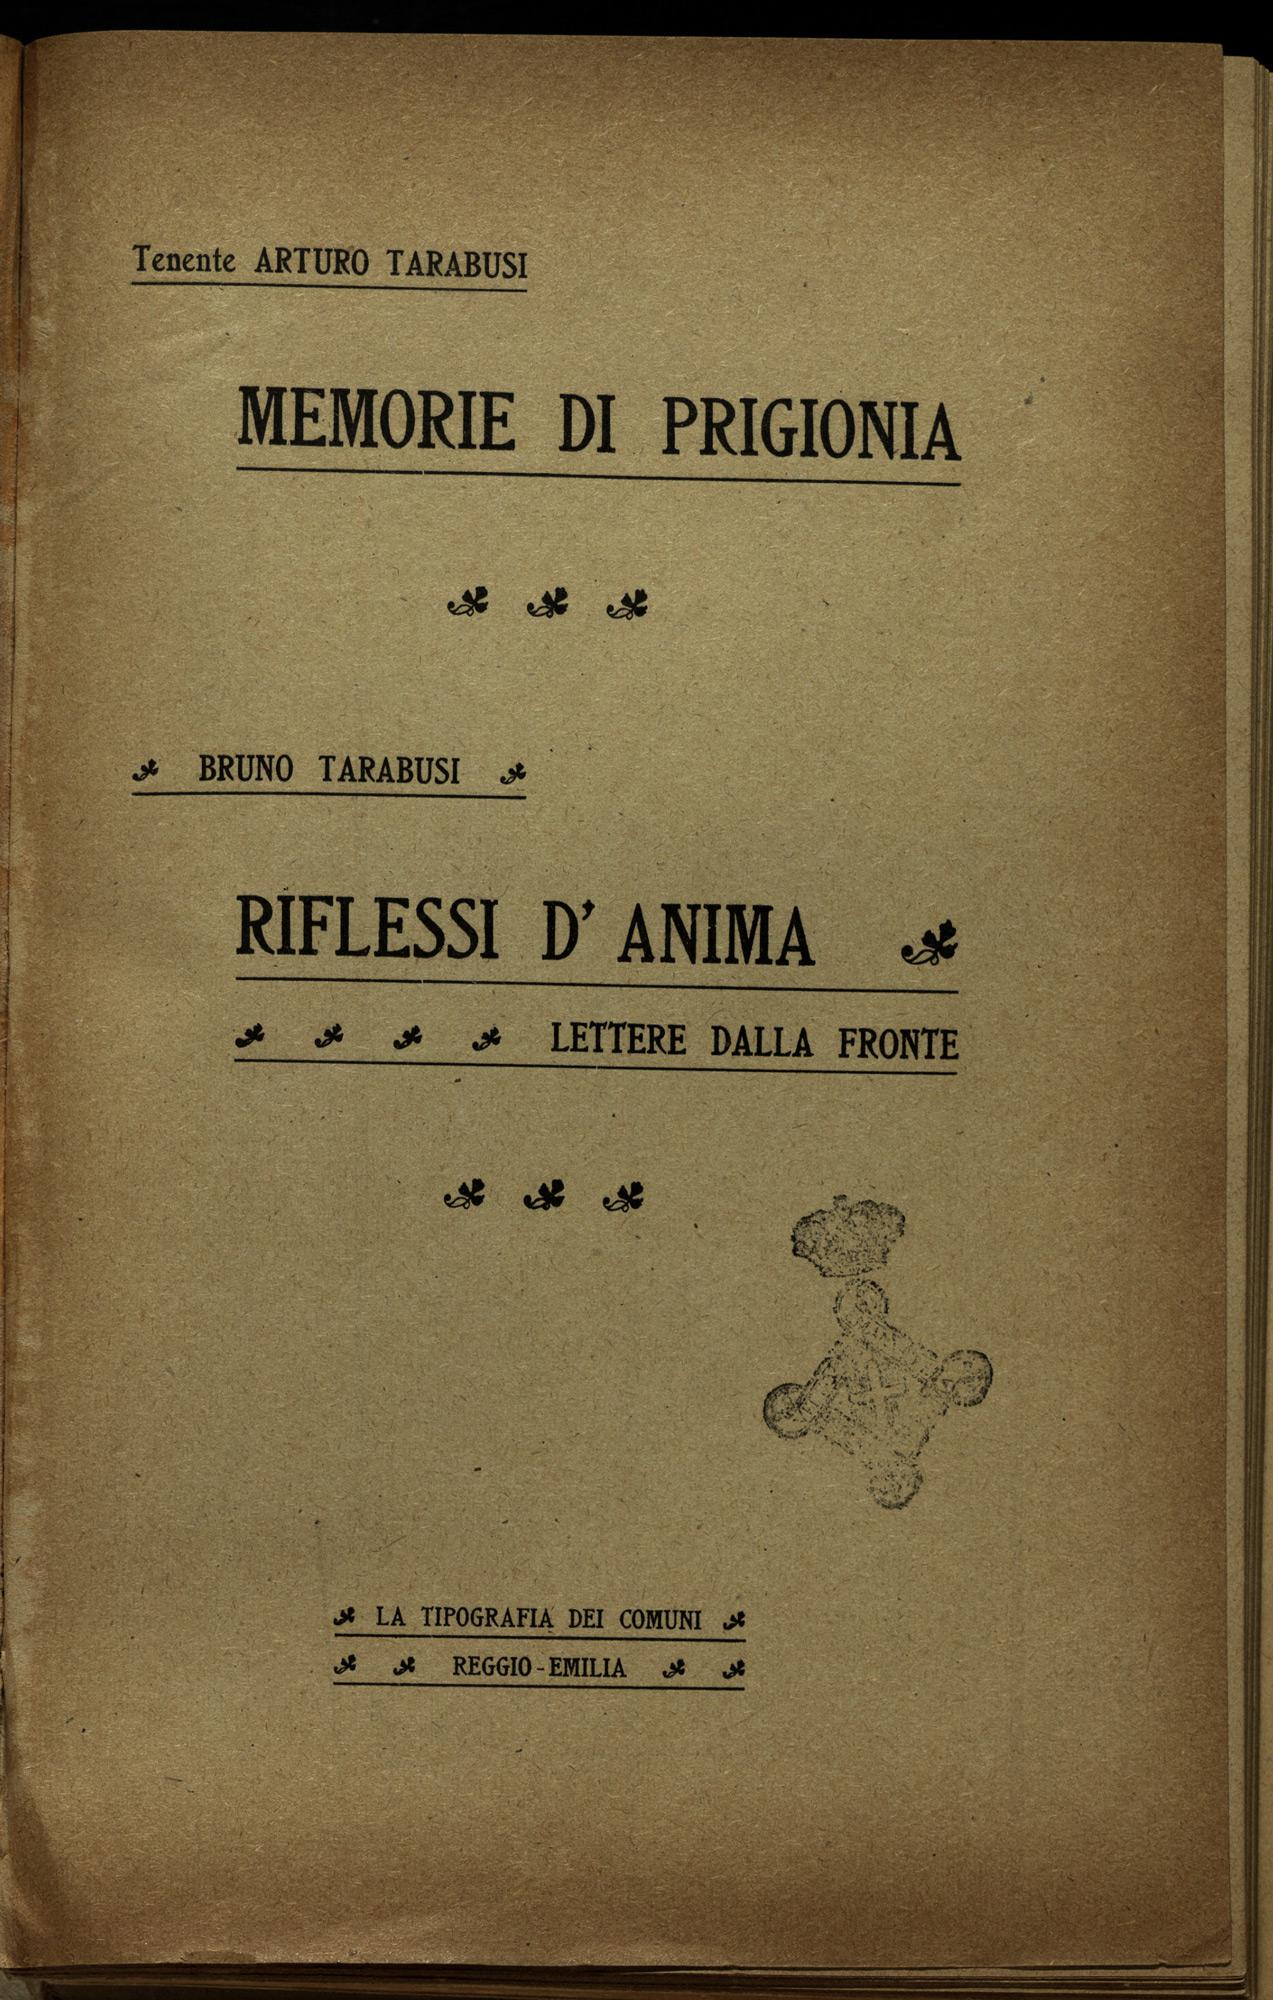 Memories of imprisonment